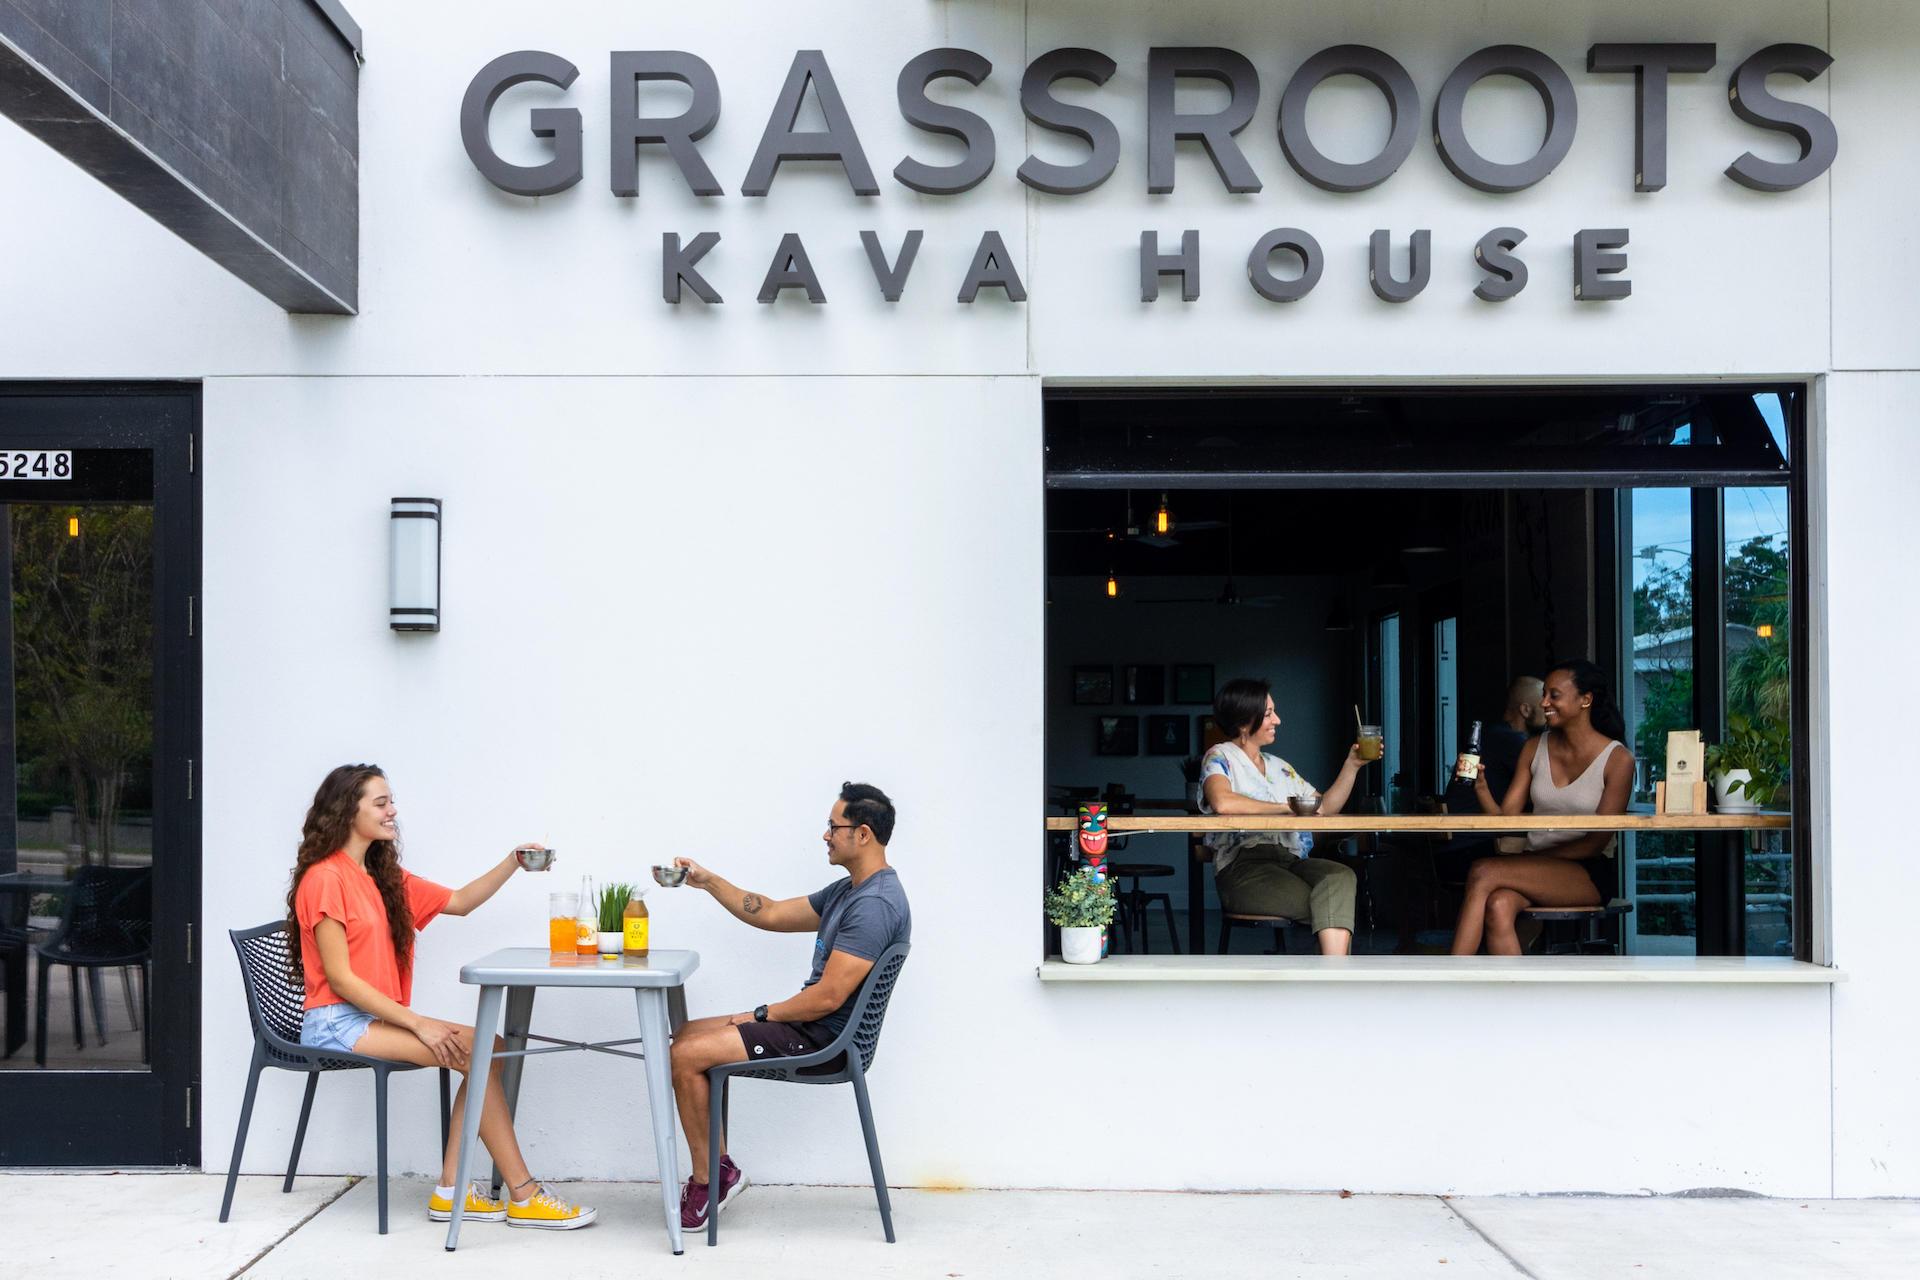 Grassroots Kava House